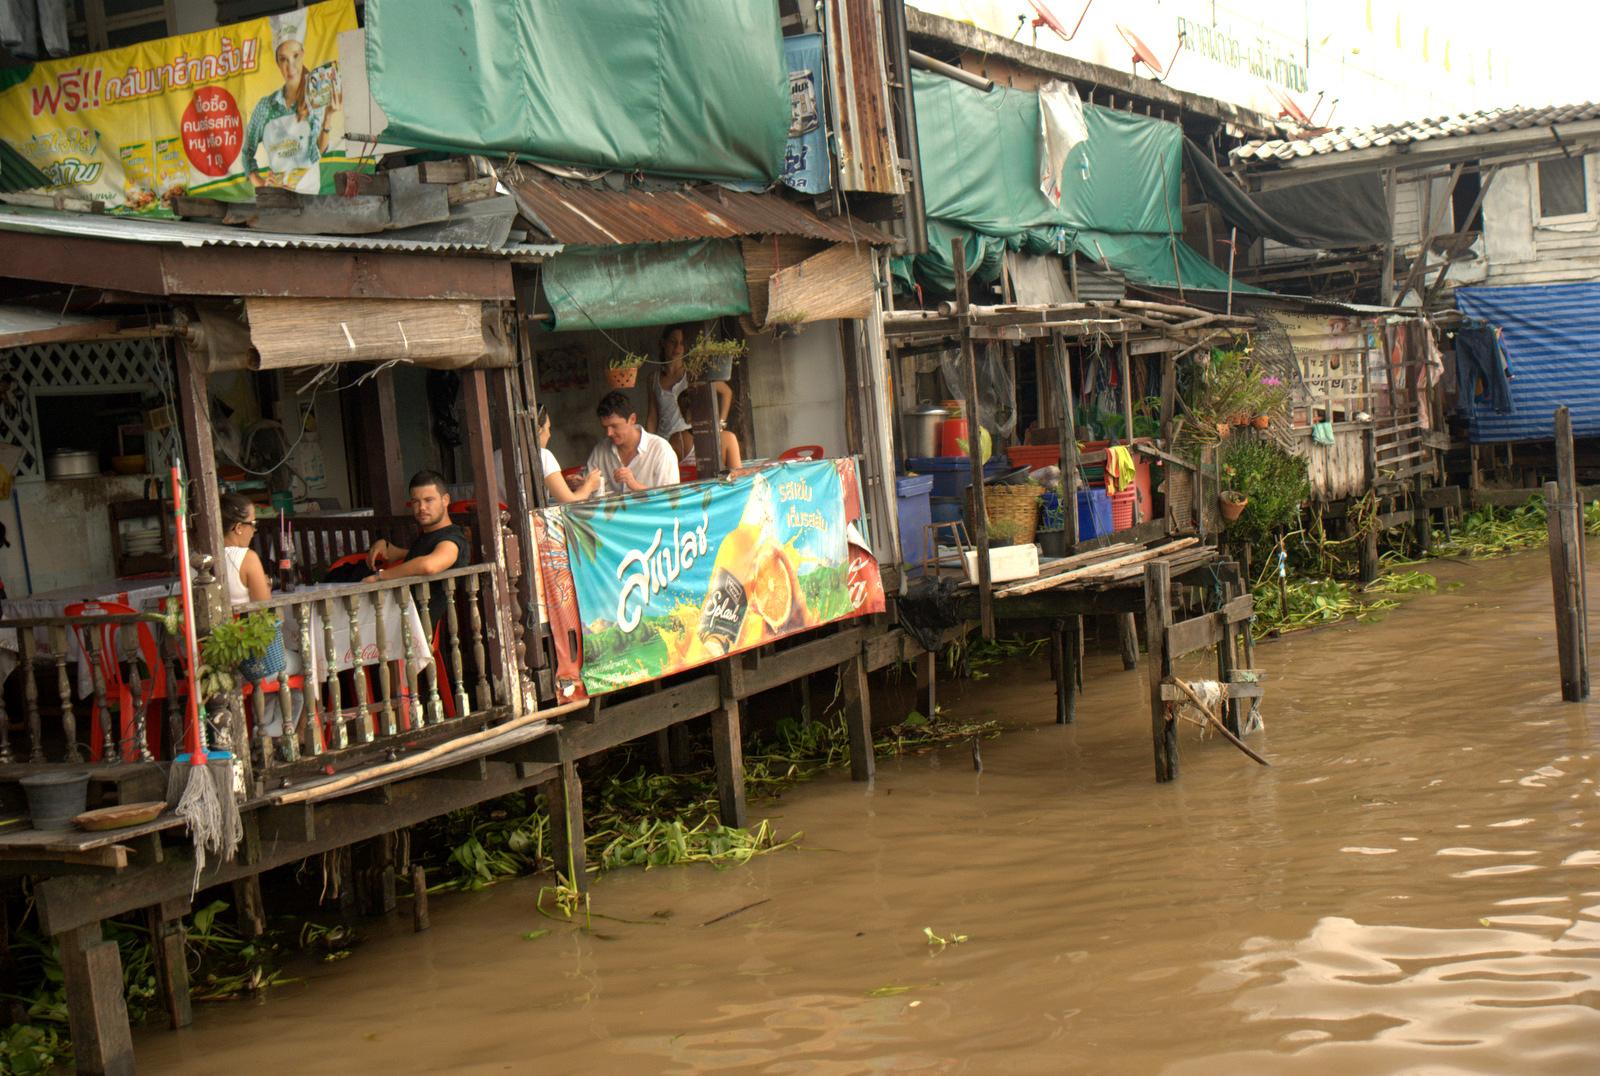 Bangkok (ostatni spacer autobusem i rzeką) 8